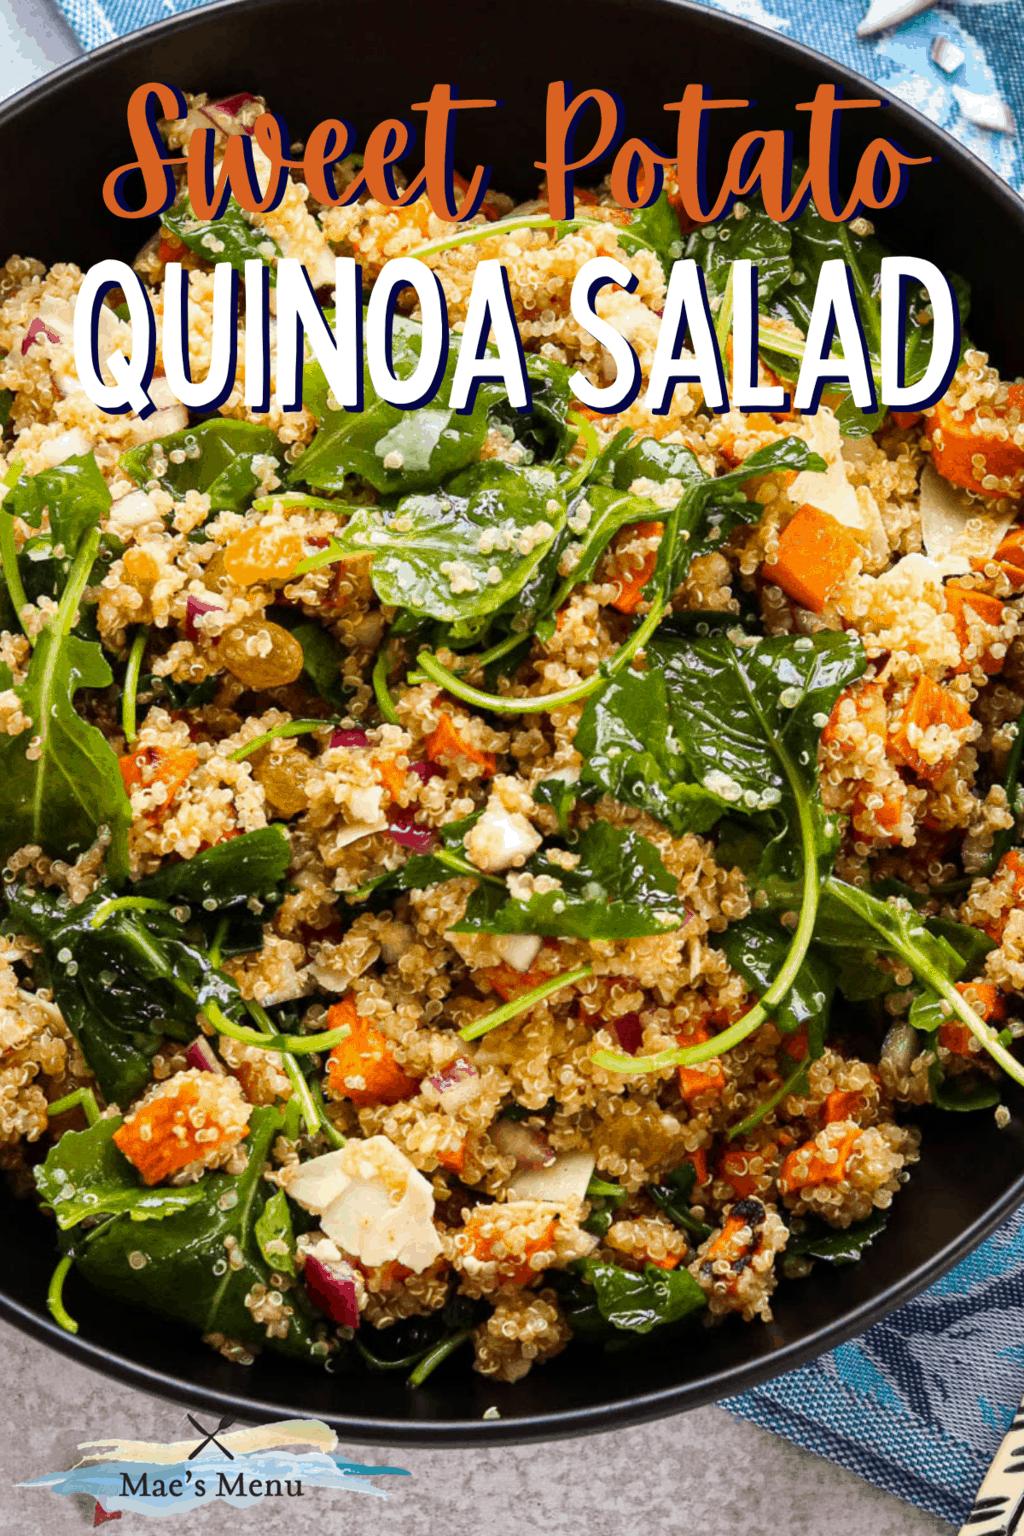 A pinterest pin for sweet potato quinoa salad with an up-close shot of a bowl of quinoa salad